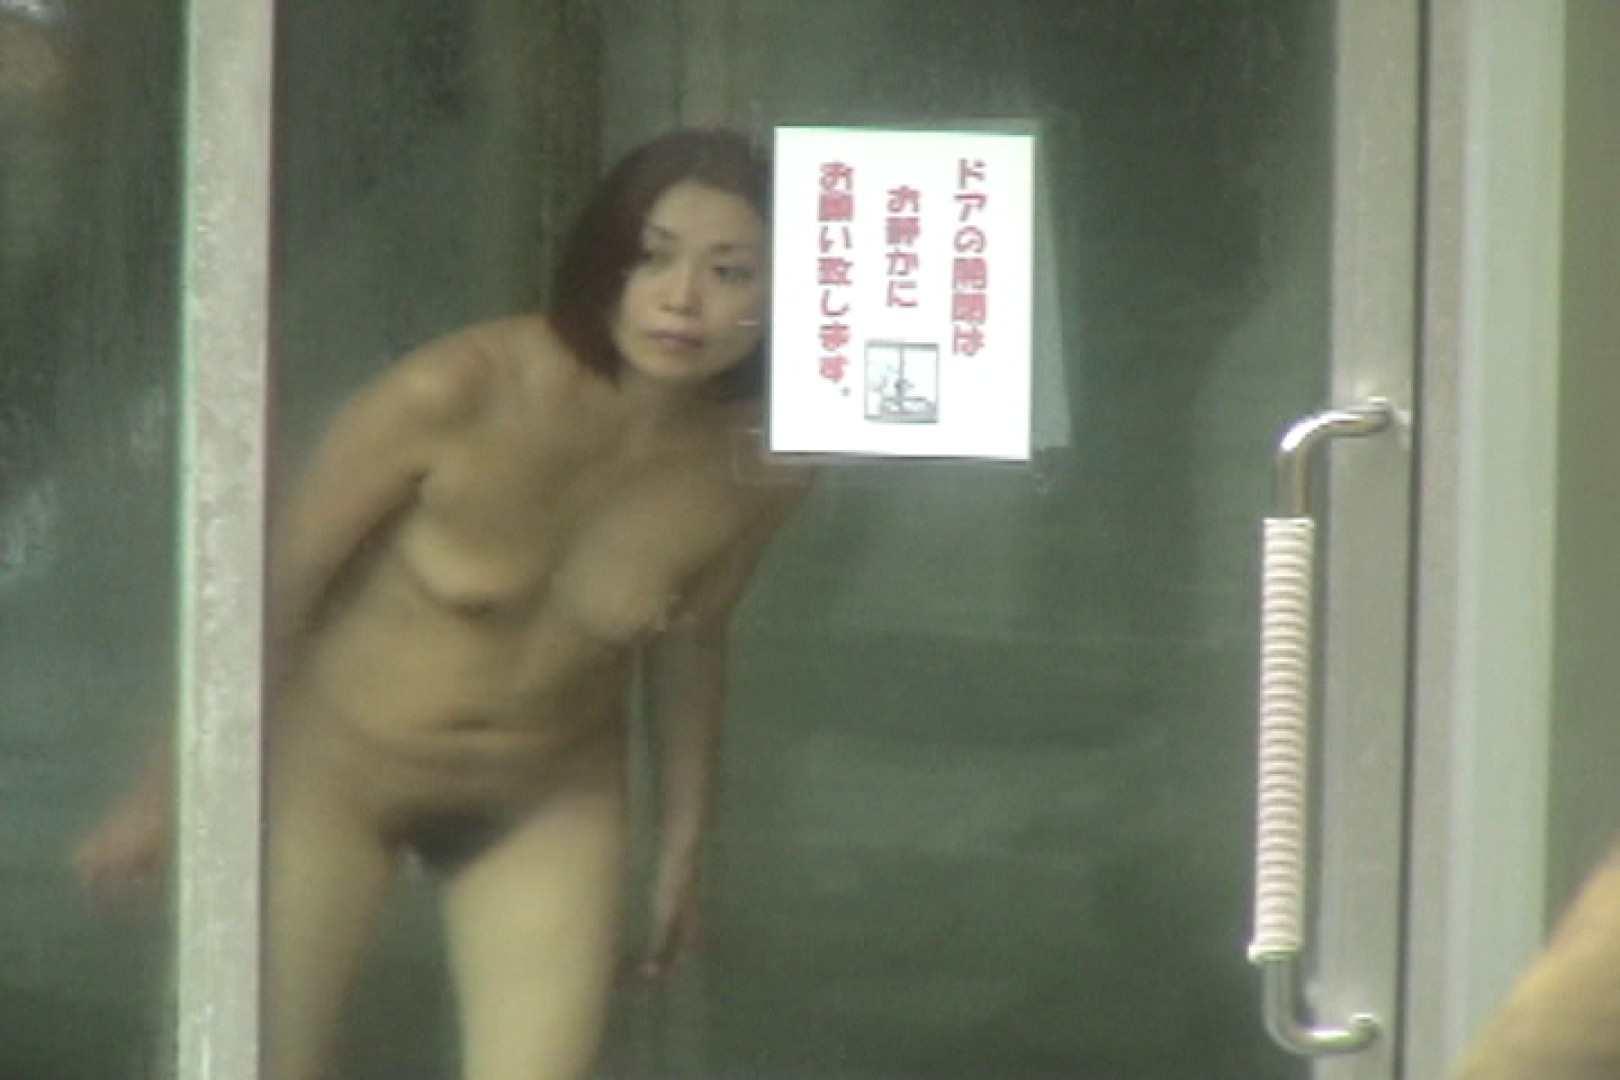 Aquaな露天風呂Vol.700 盗撮 ぱこり動画紹介 97画像 74